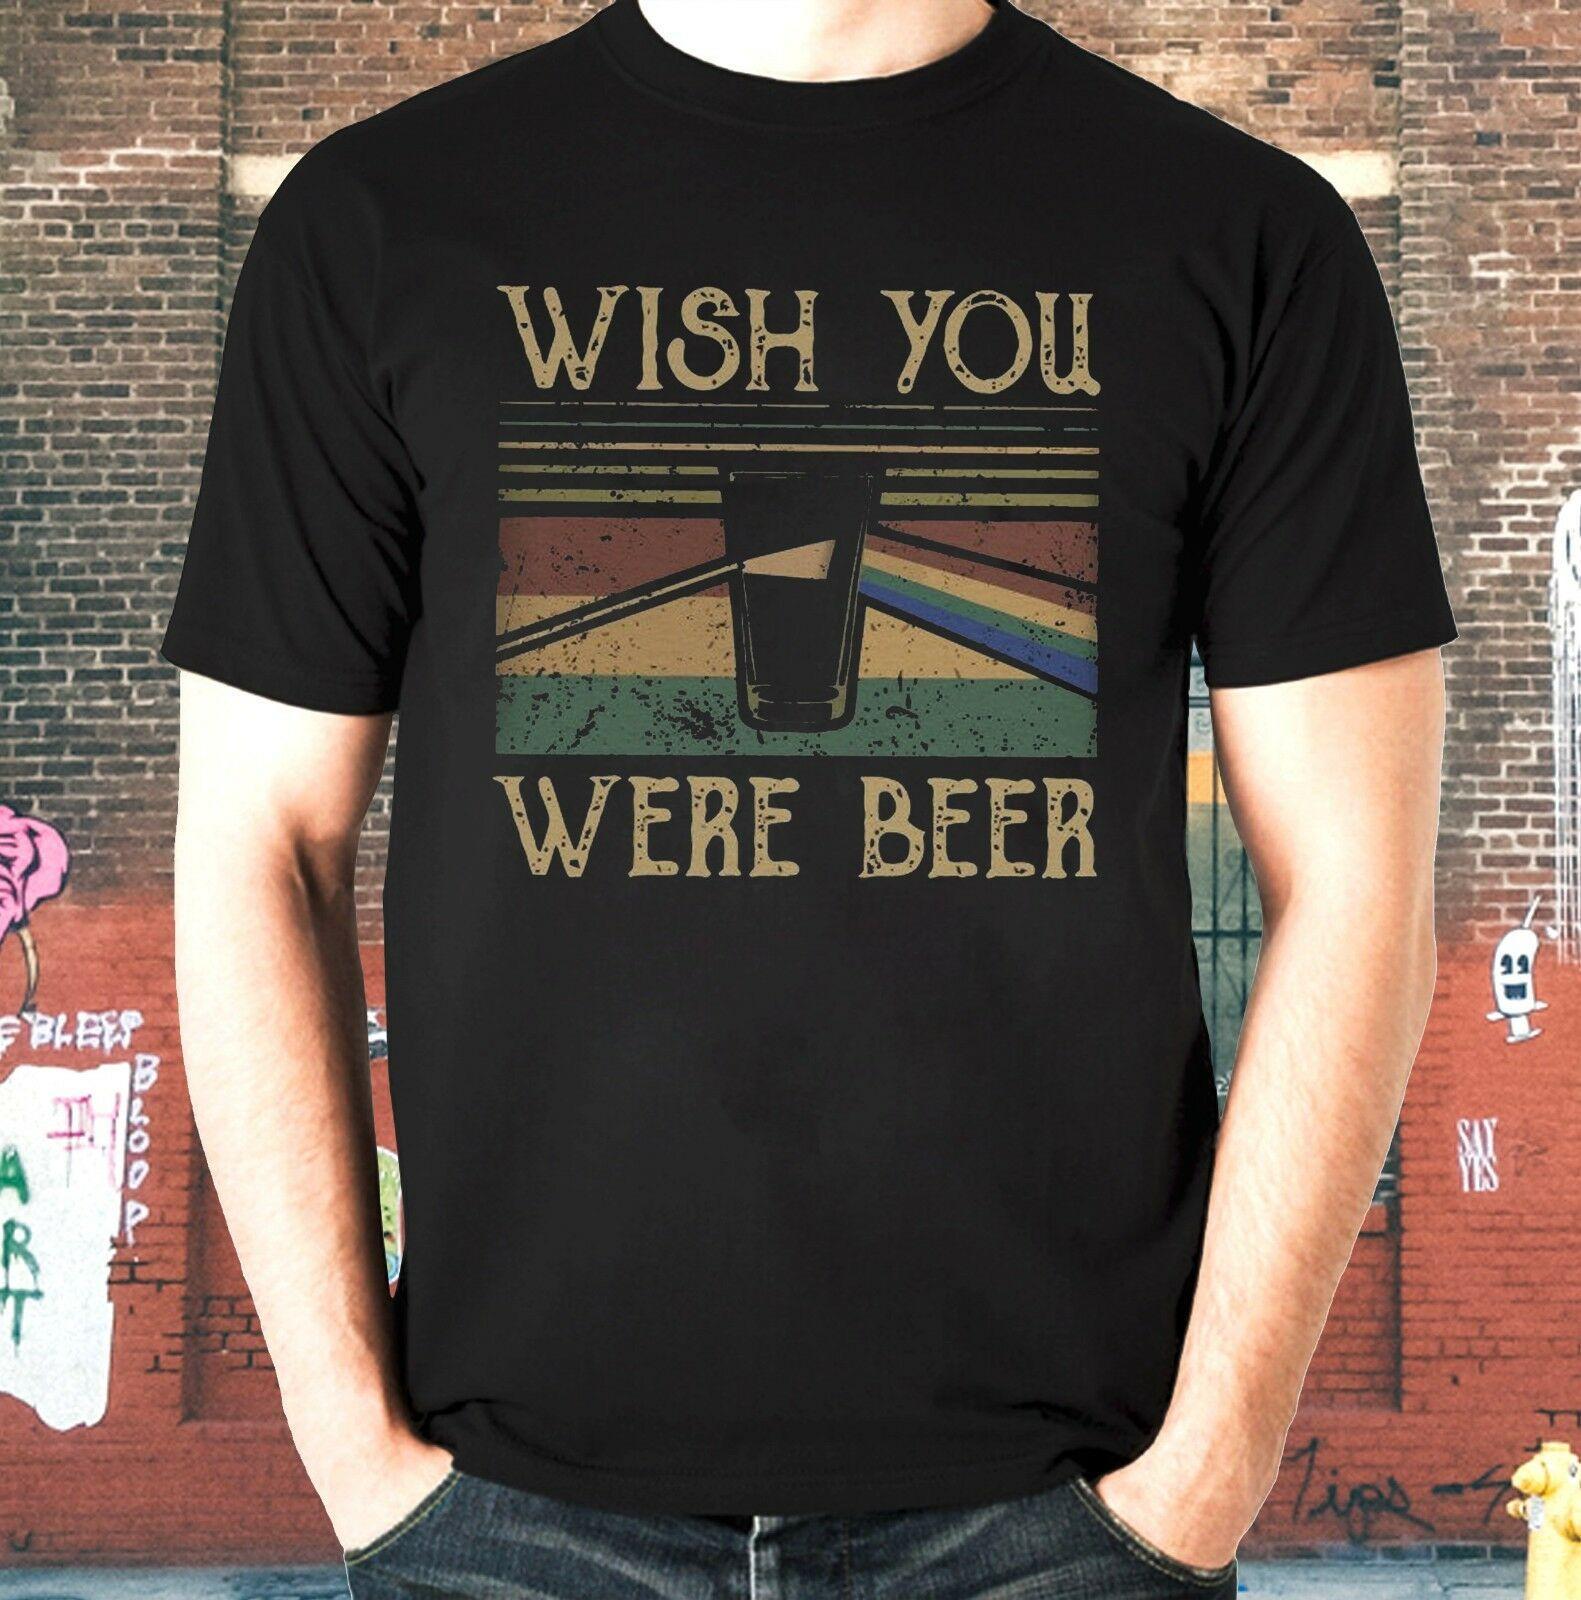 Pink Floyd T Shirt Green Swirl Band Logo retro vintage new Official Mens Black